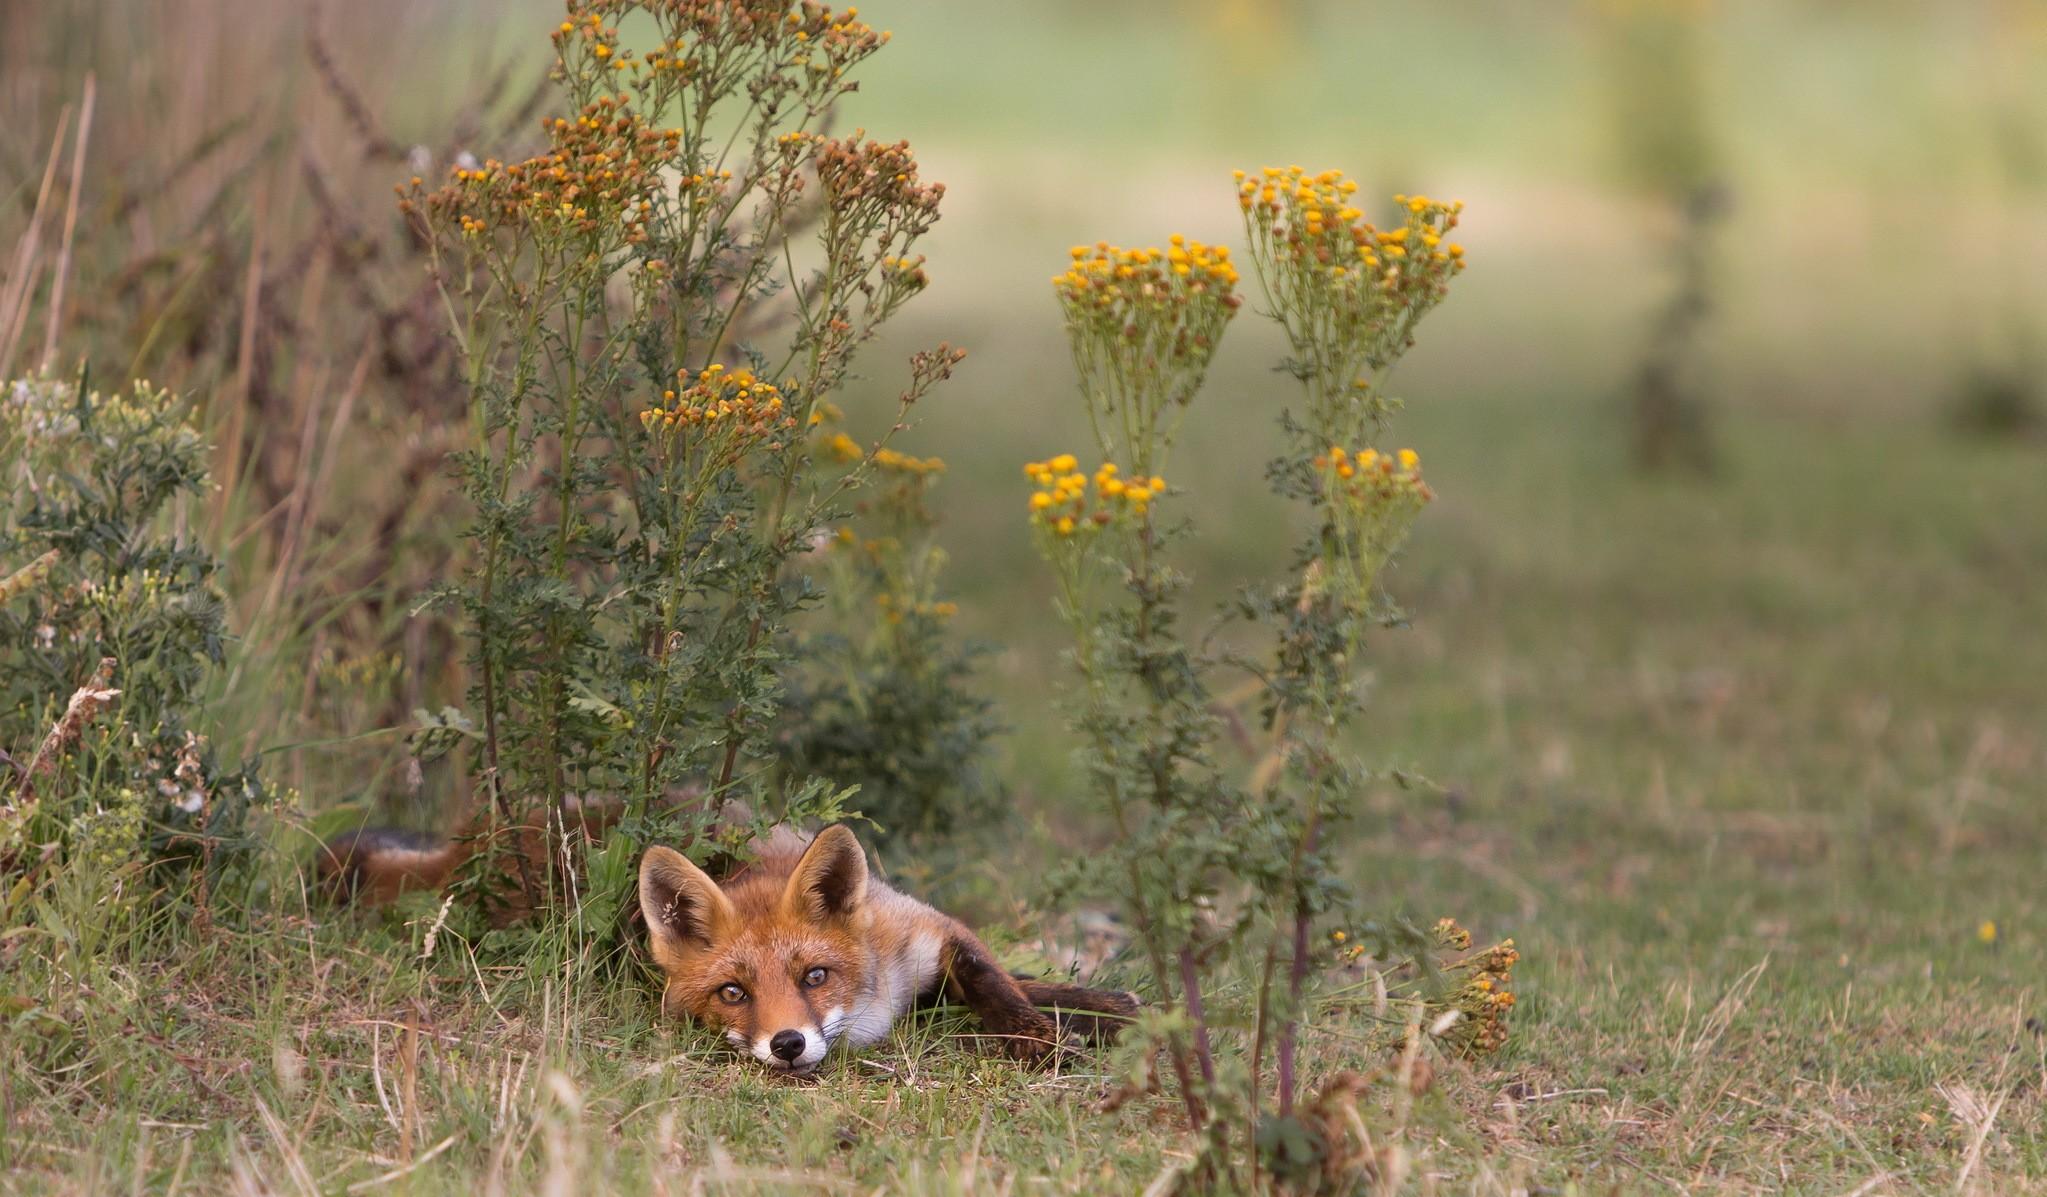 General 2047x1197 fox animals plants